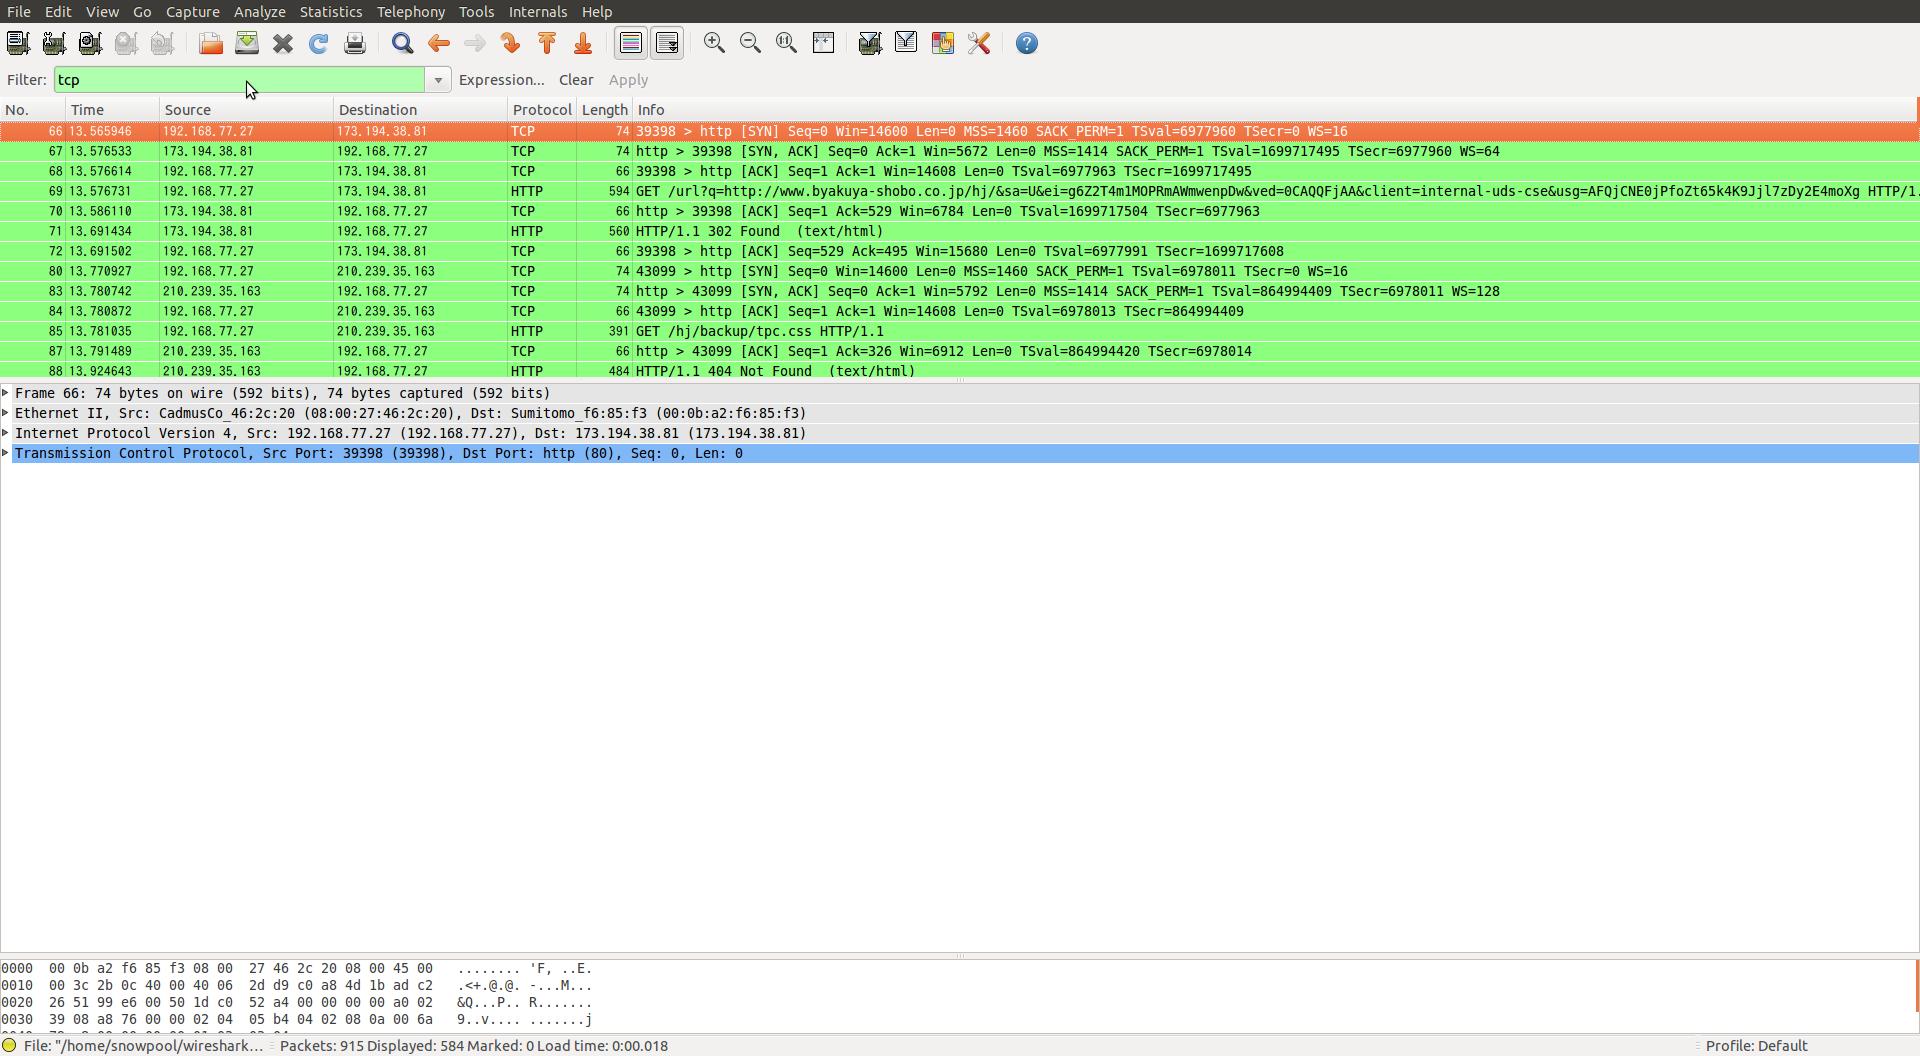 Screenshot-2012-04-17 21:20:51